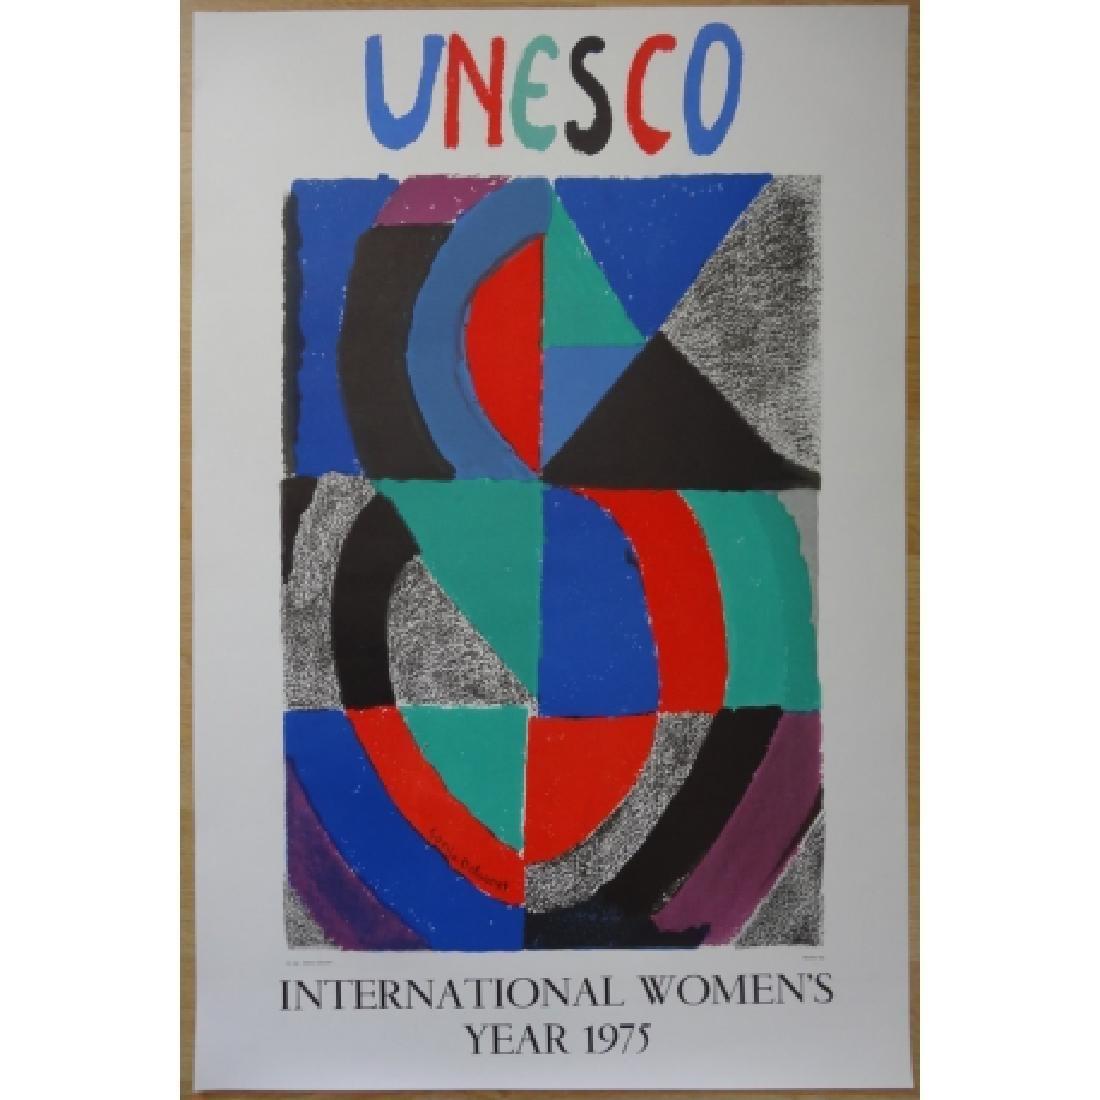 International women's year 1975 Lithograph